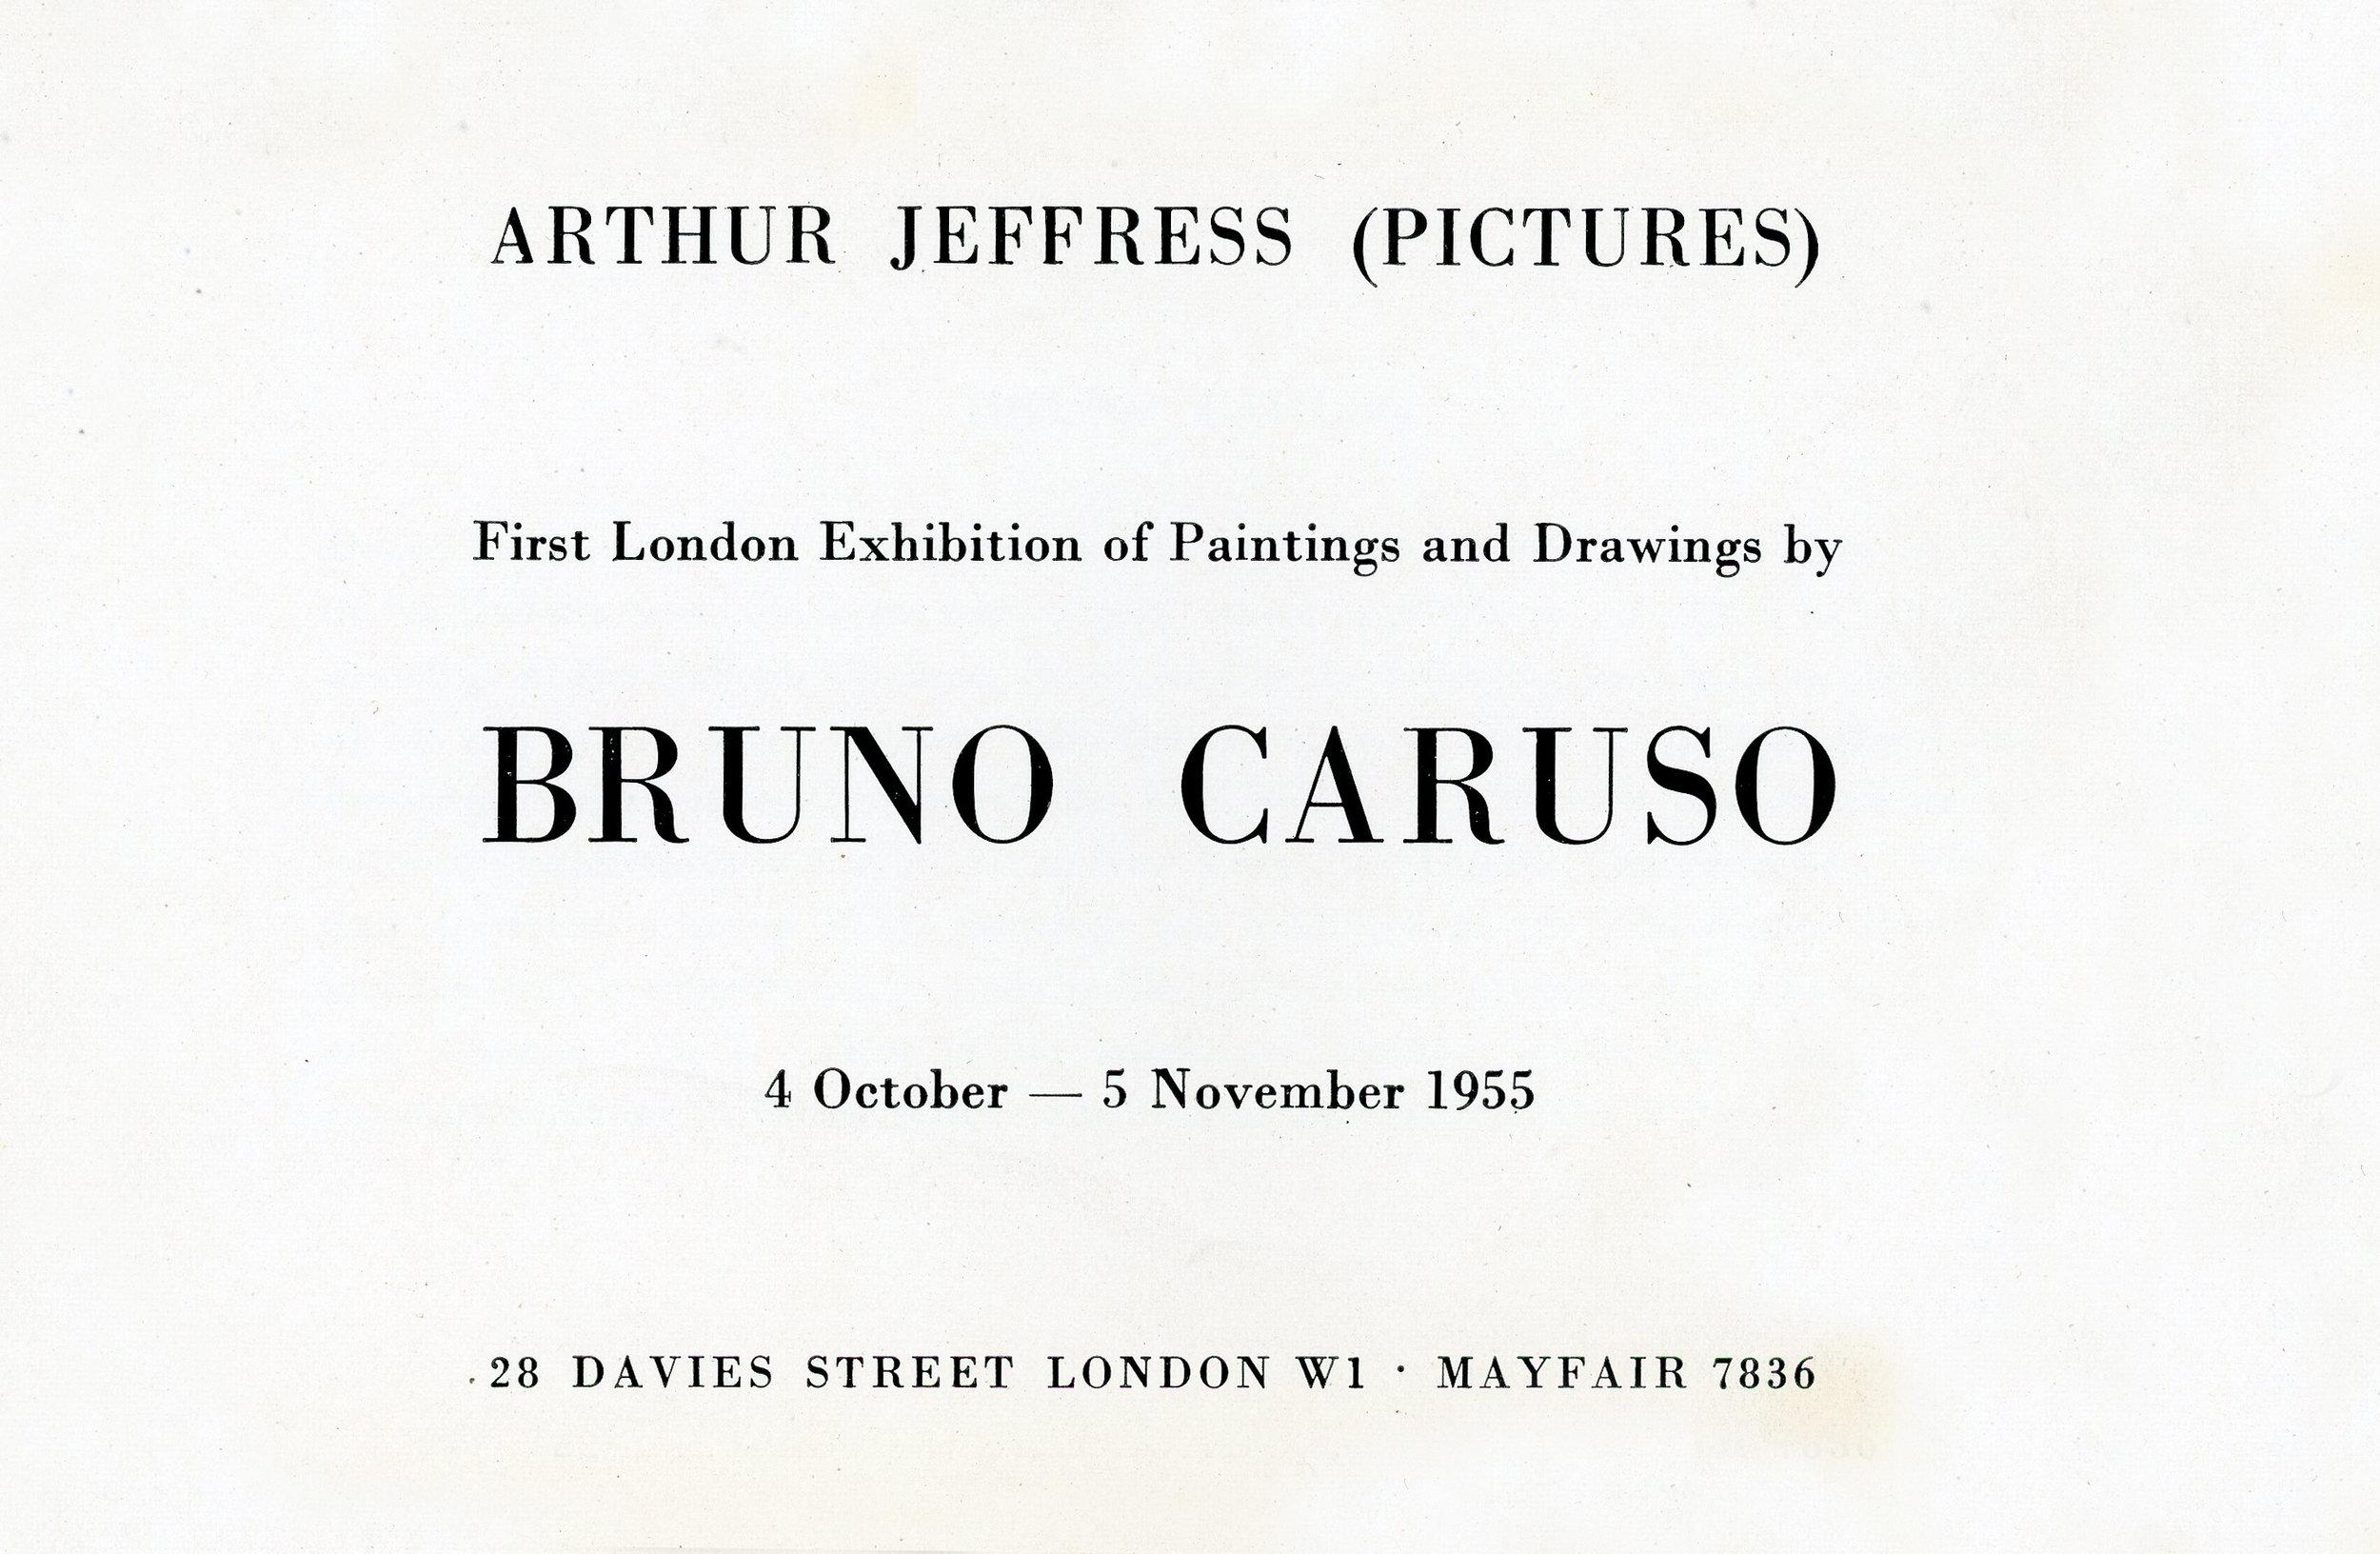 1955-10 Arthur Jeffress - Bruno Caruso_02.jpg